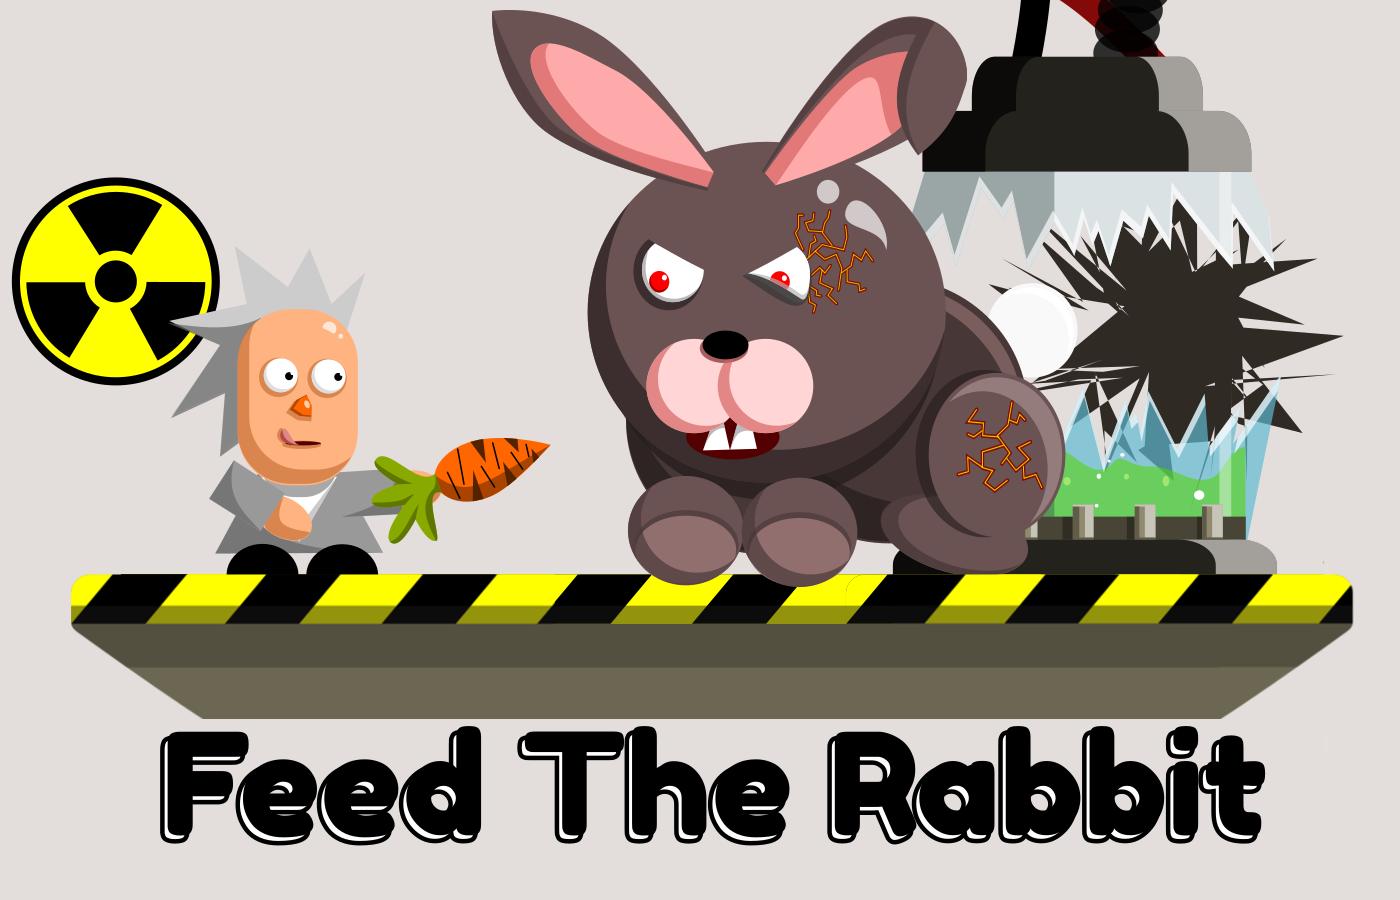 Feed The Rabbit